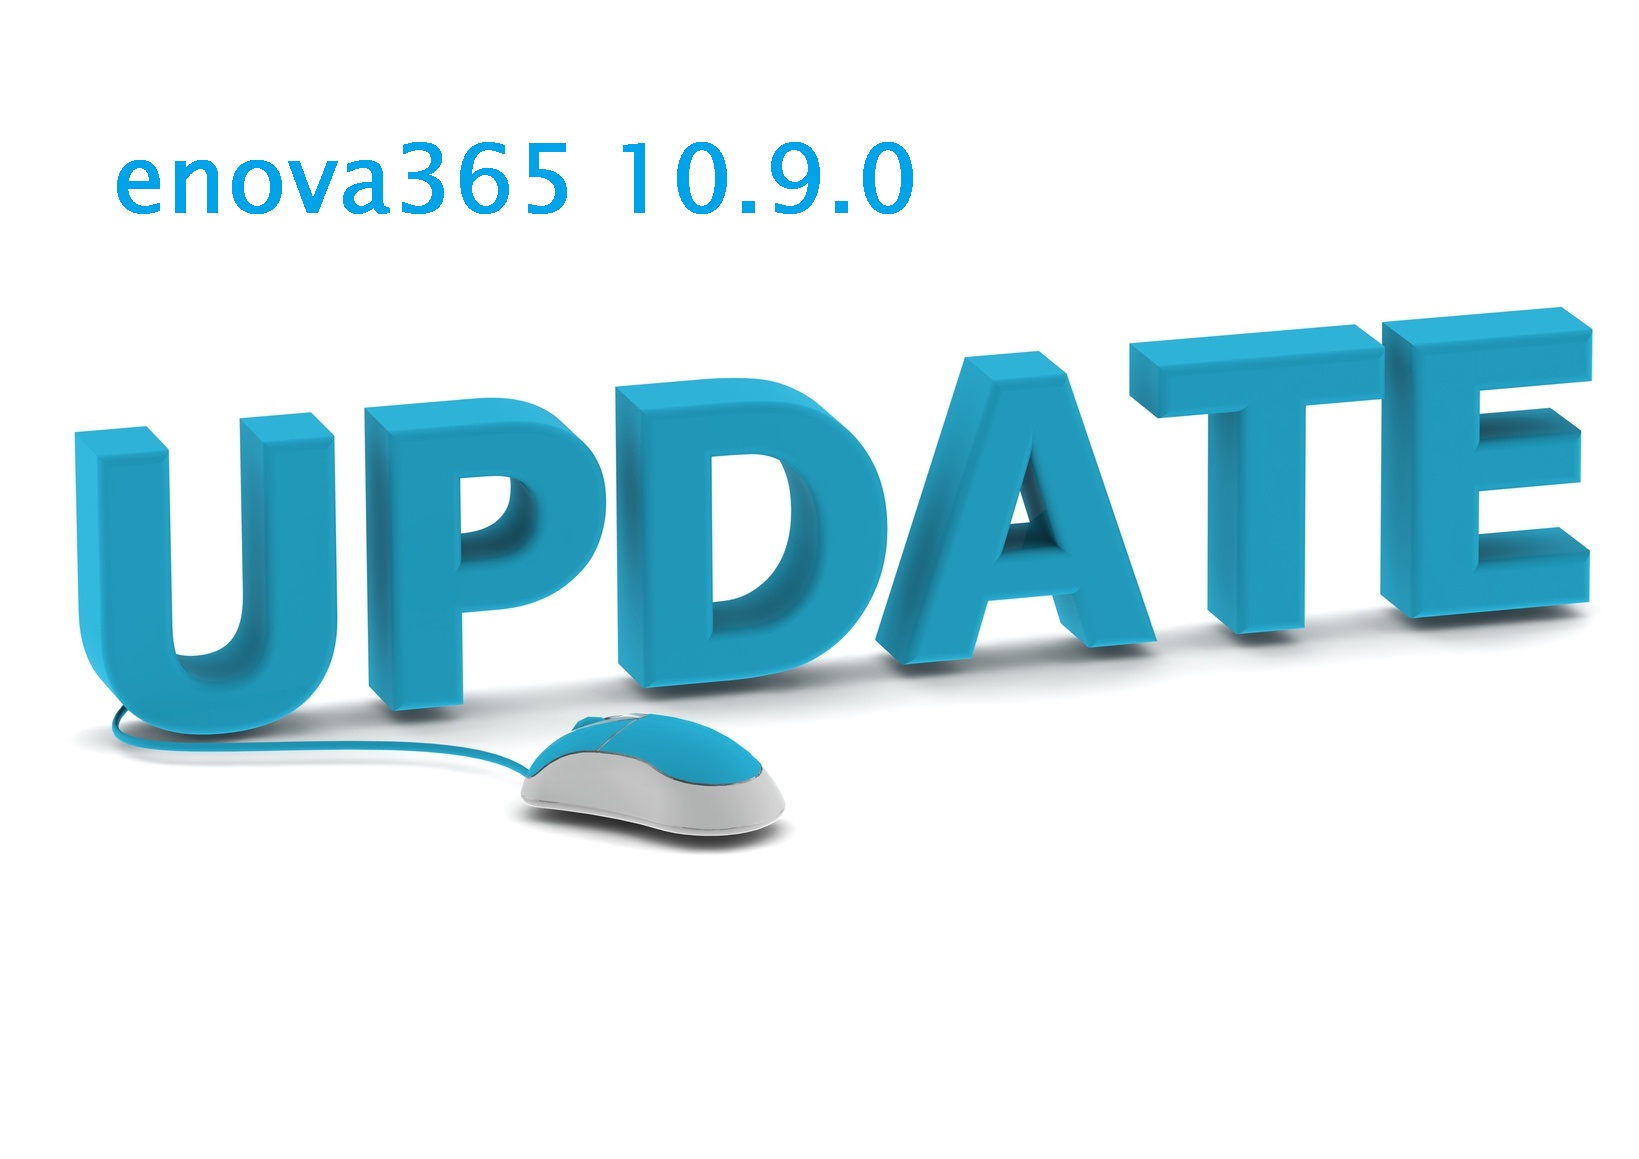 enova365 wersja 10.9.0